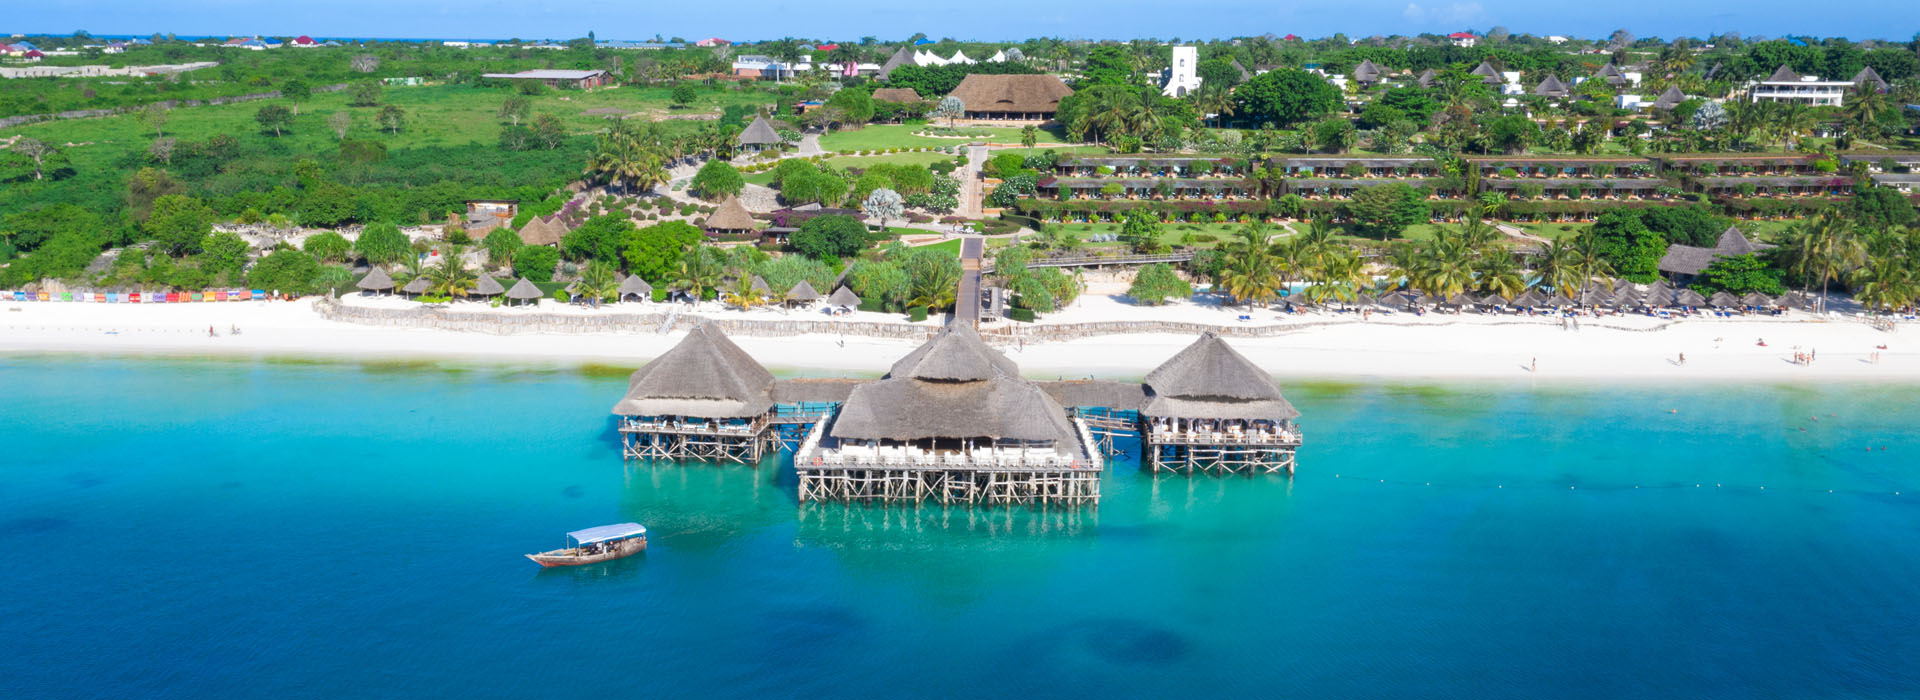 Bwejuu Beach - Zanzibar Top Destination - African Adventure Specialists